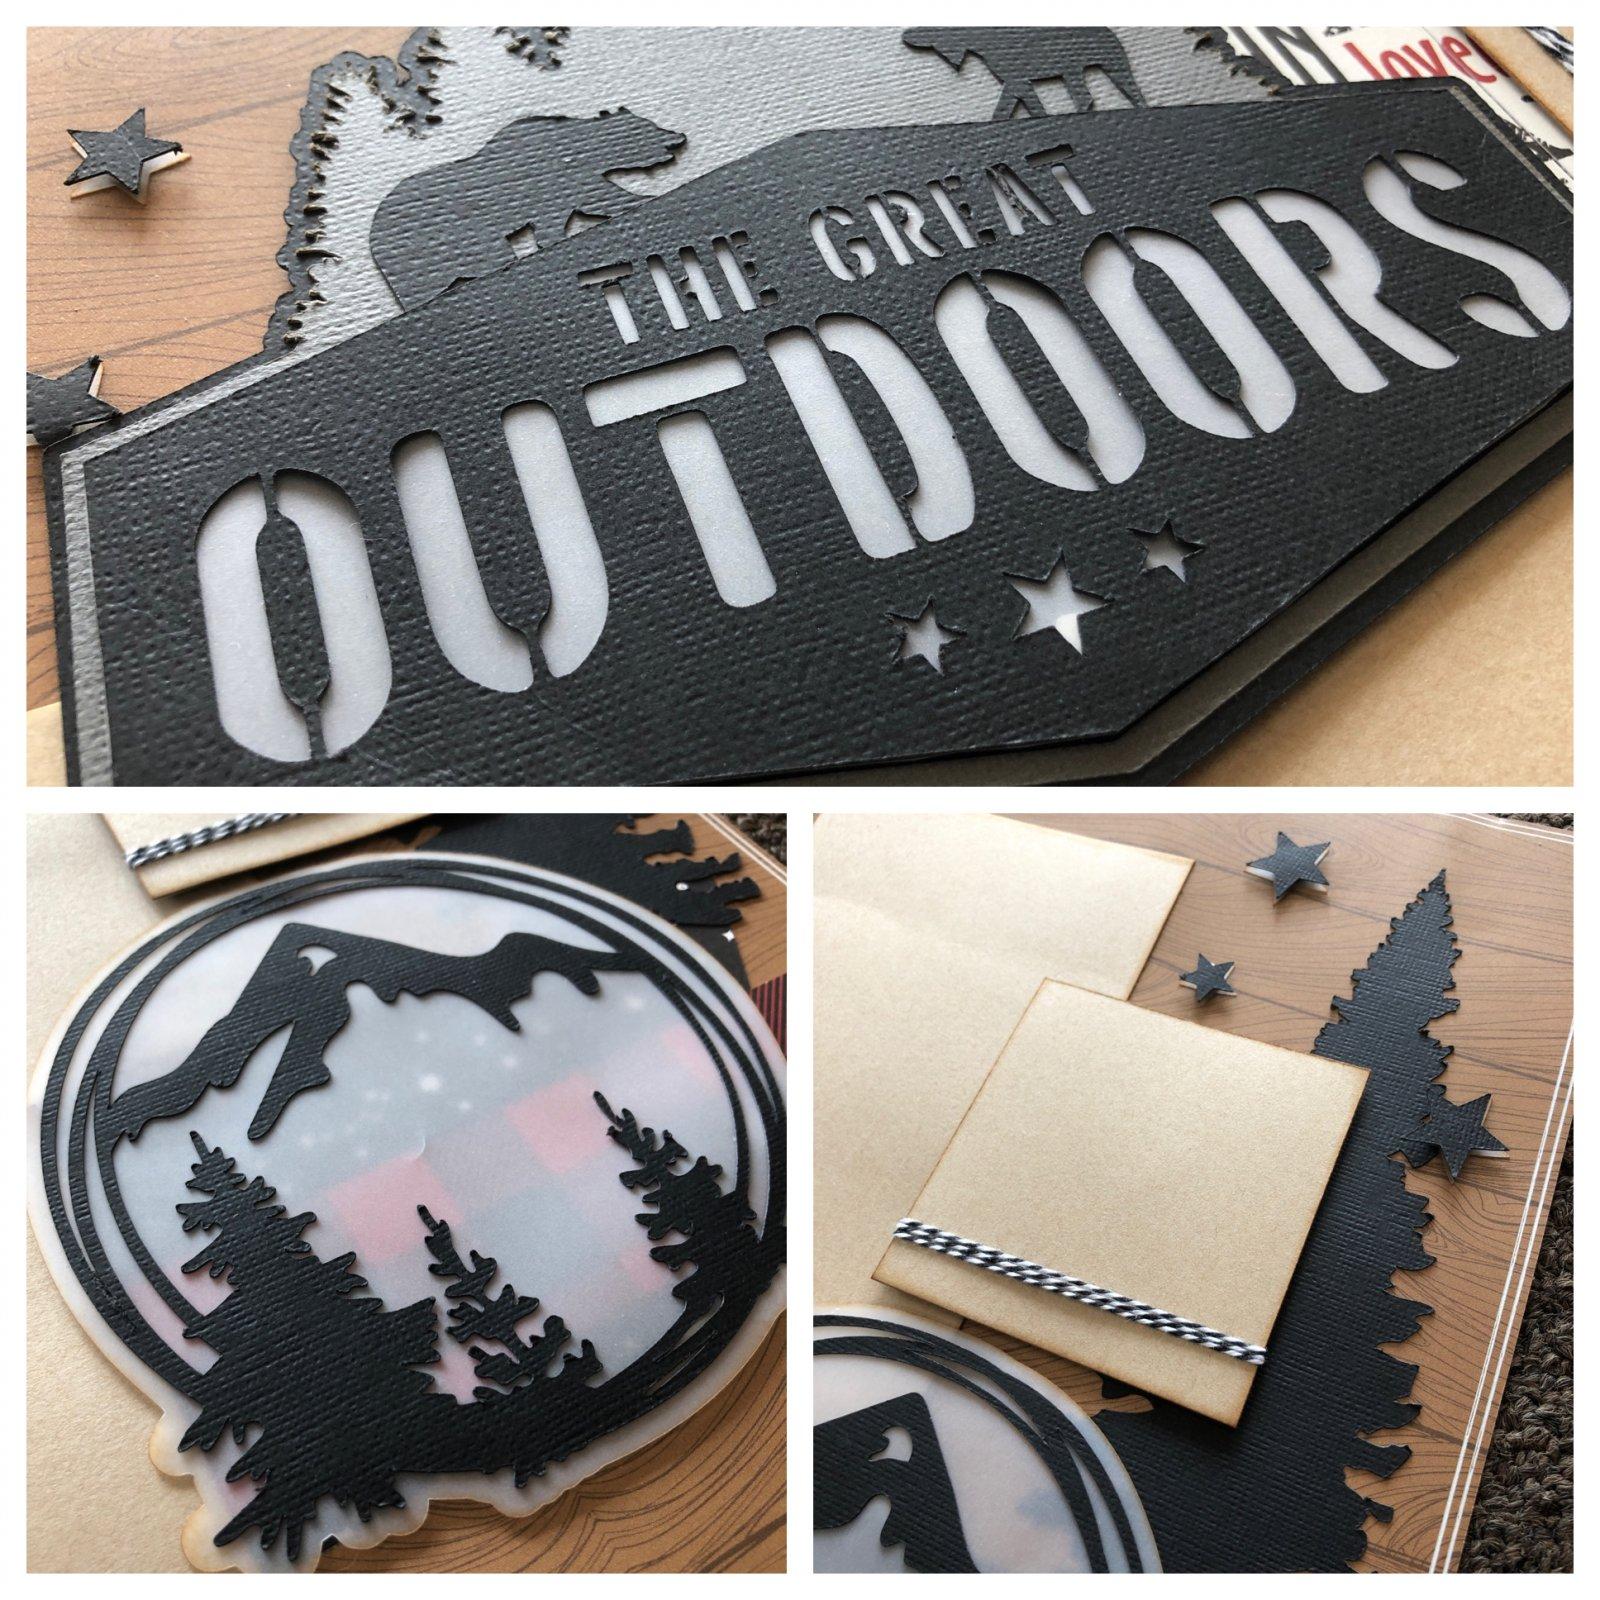 The Great Outdoors Kit (Buffalo Plaid)